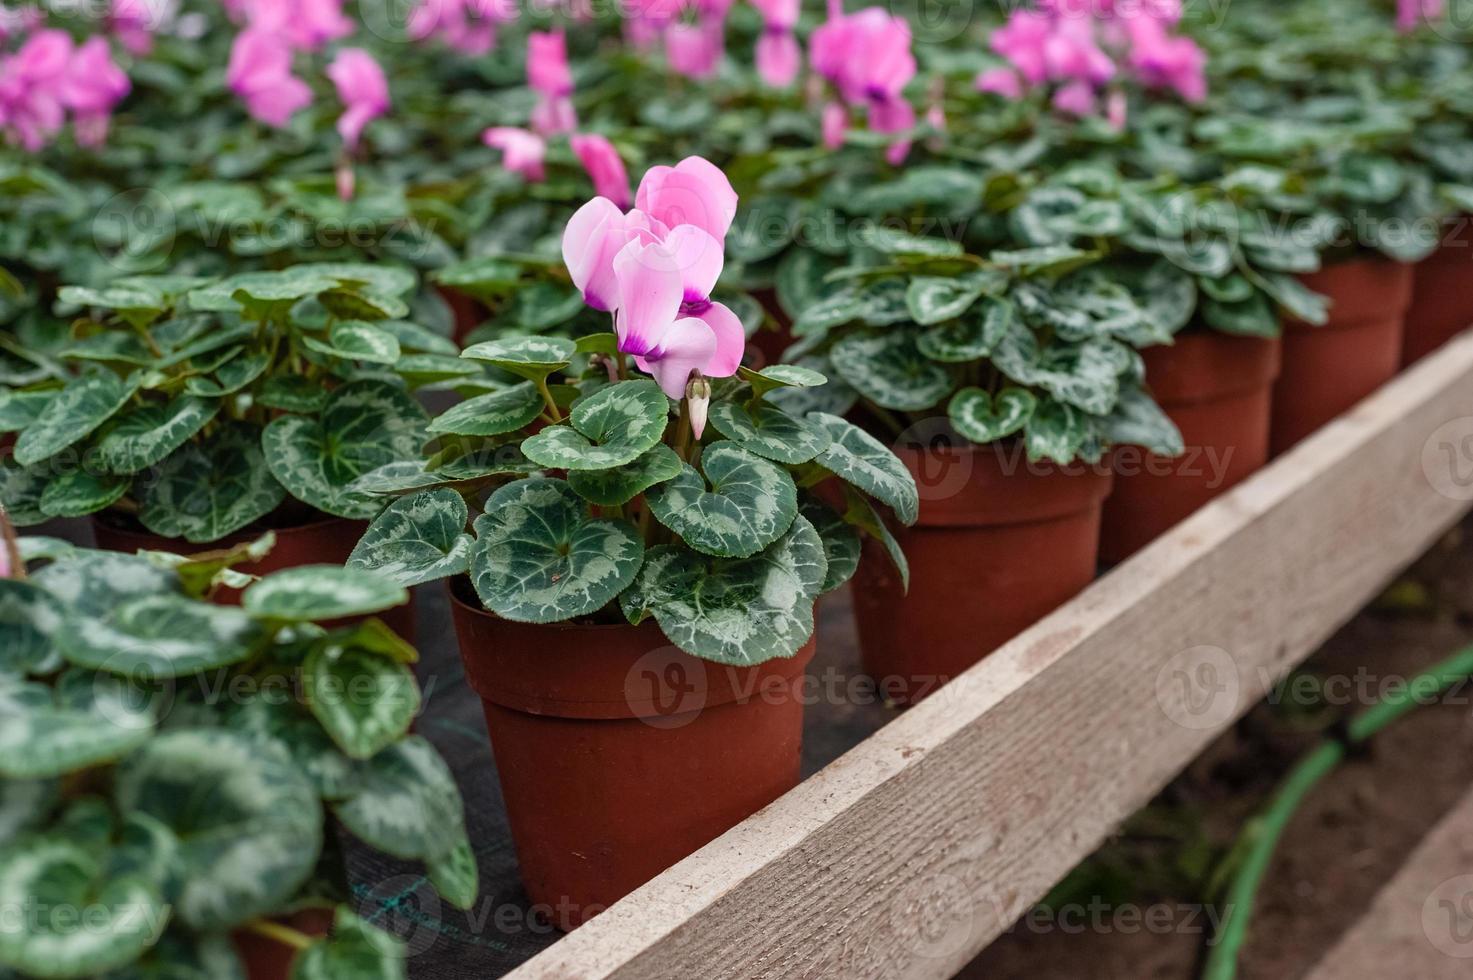 Flower culture in a greenhouse photo